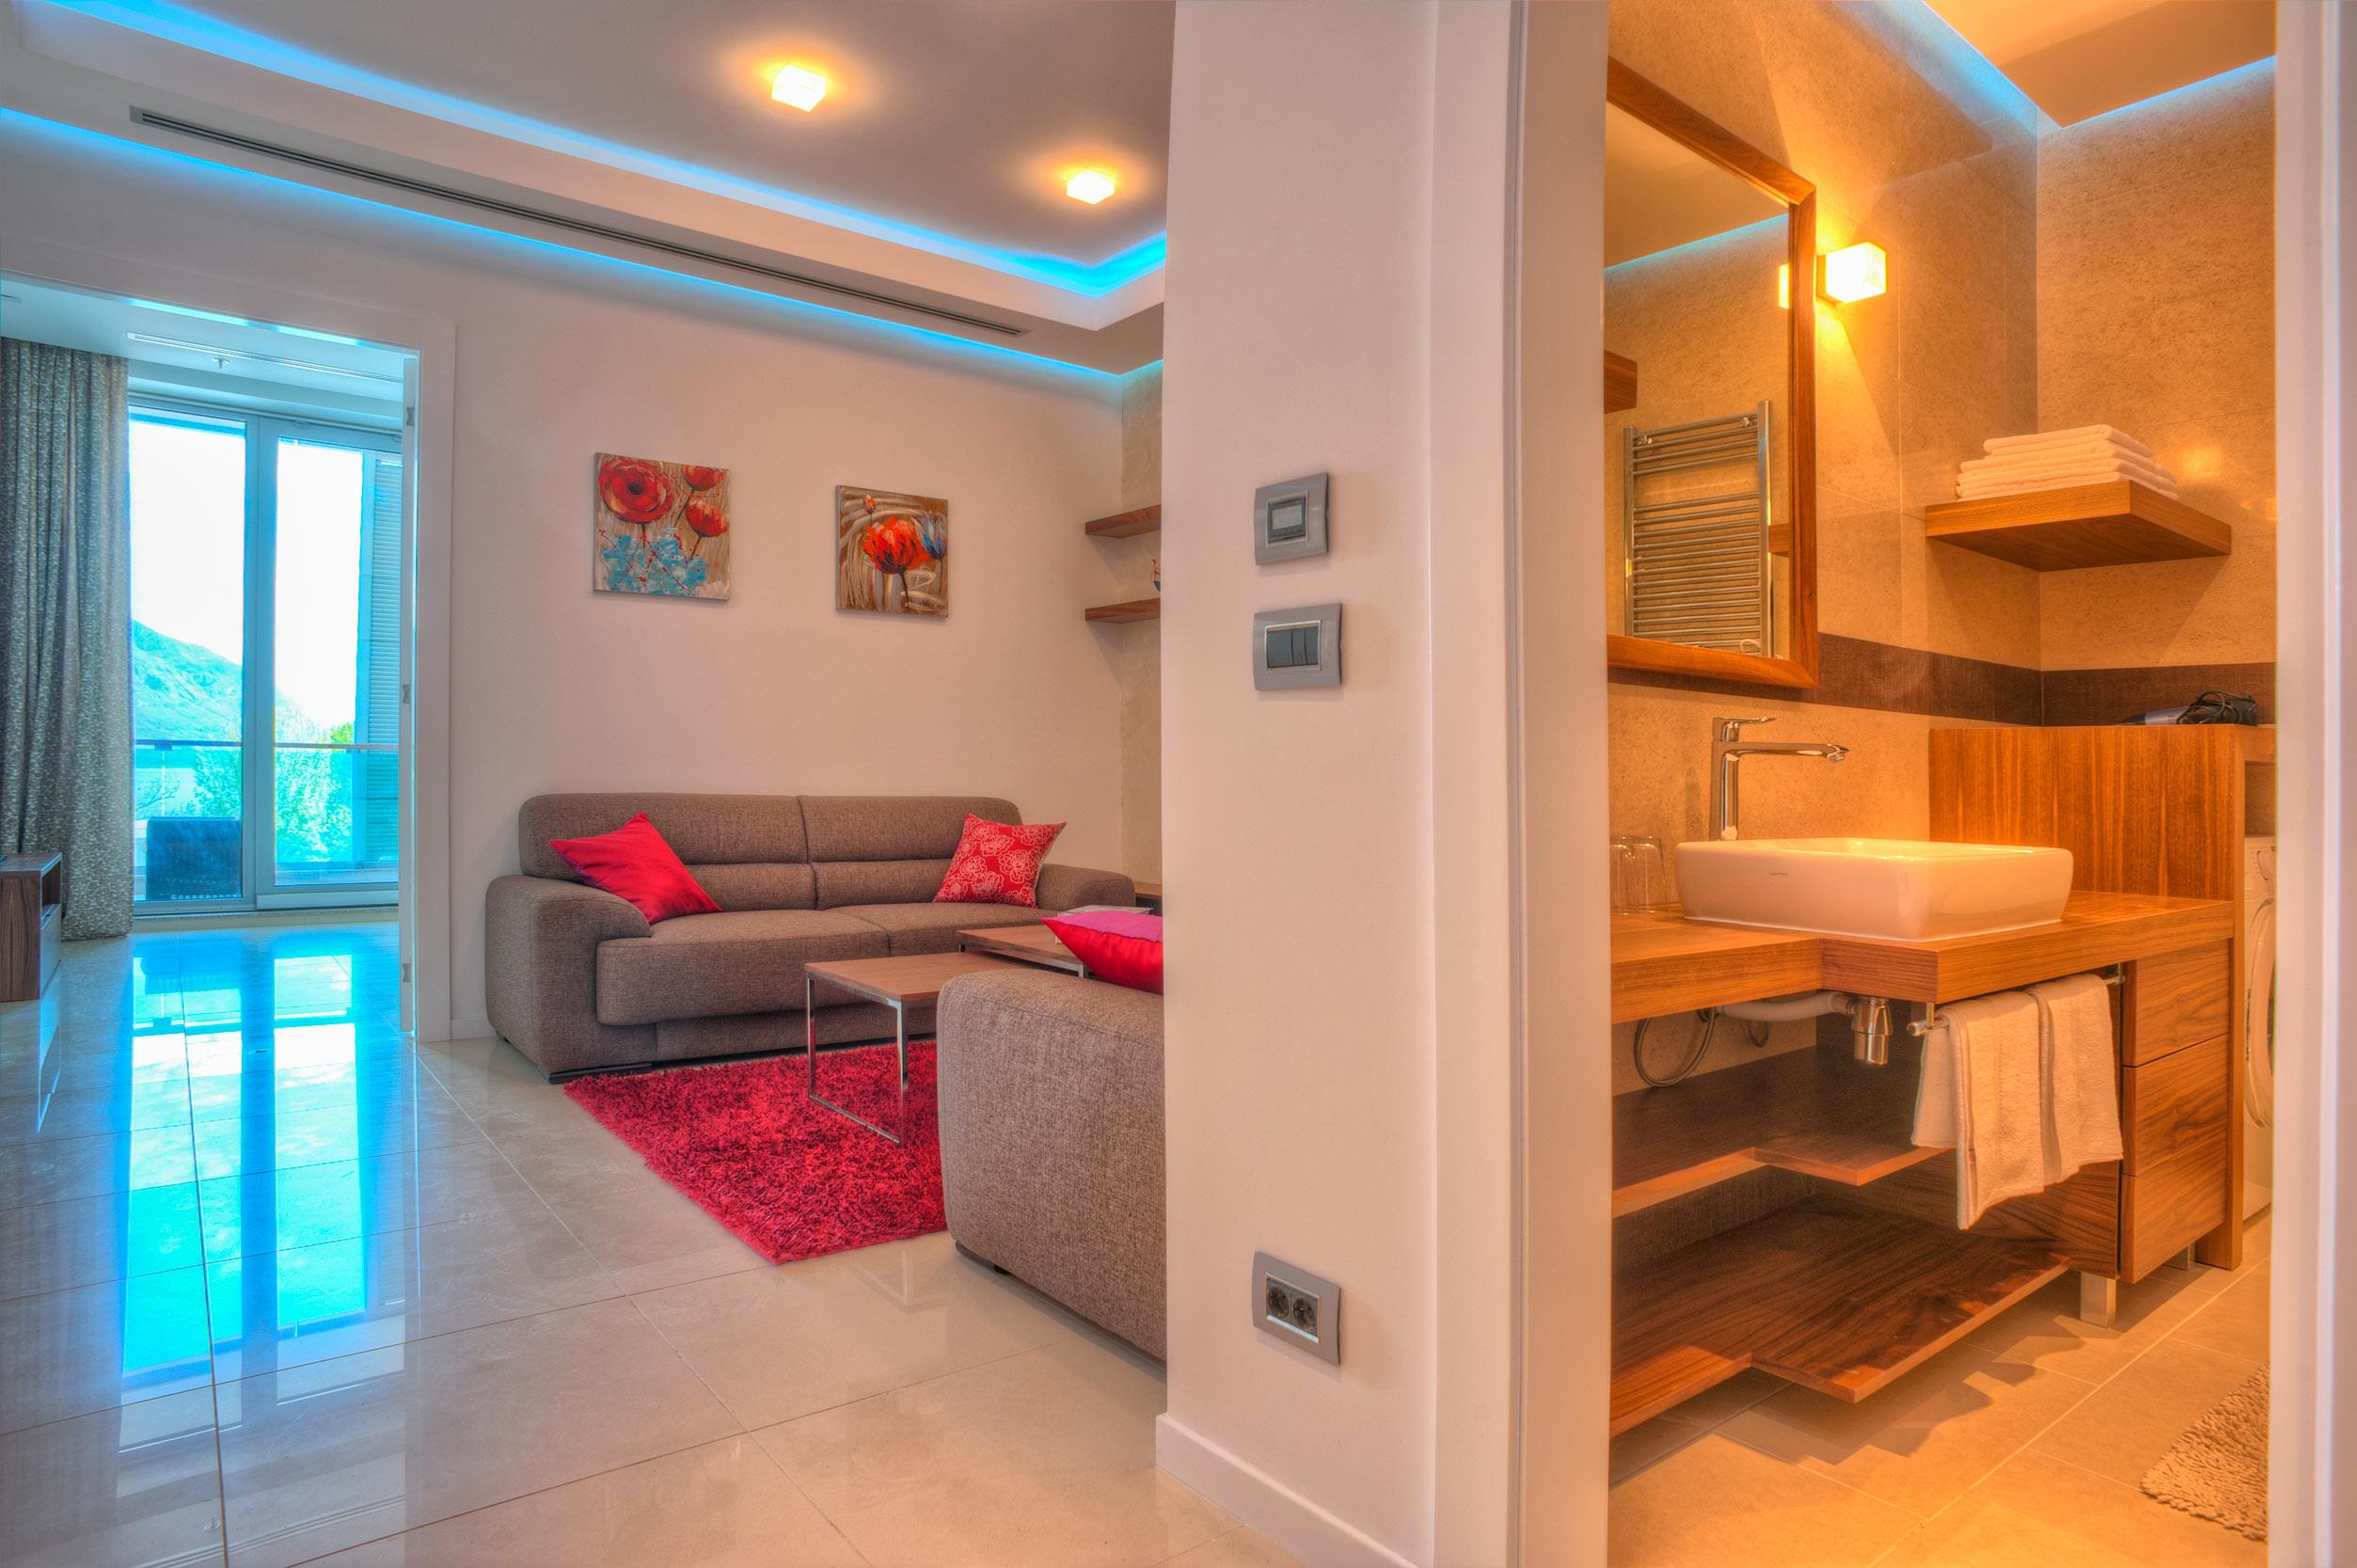 Apartment for sale near Old Town Budva